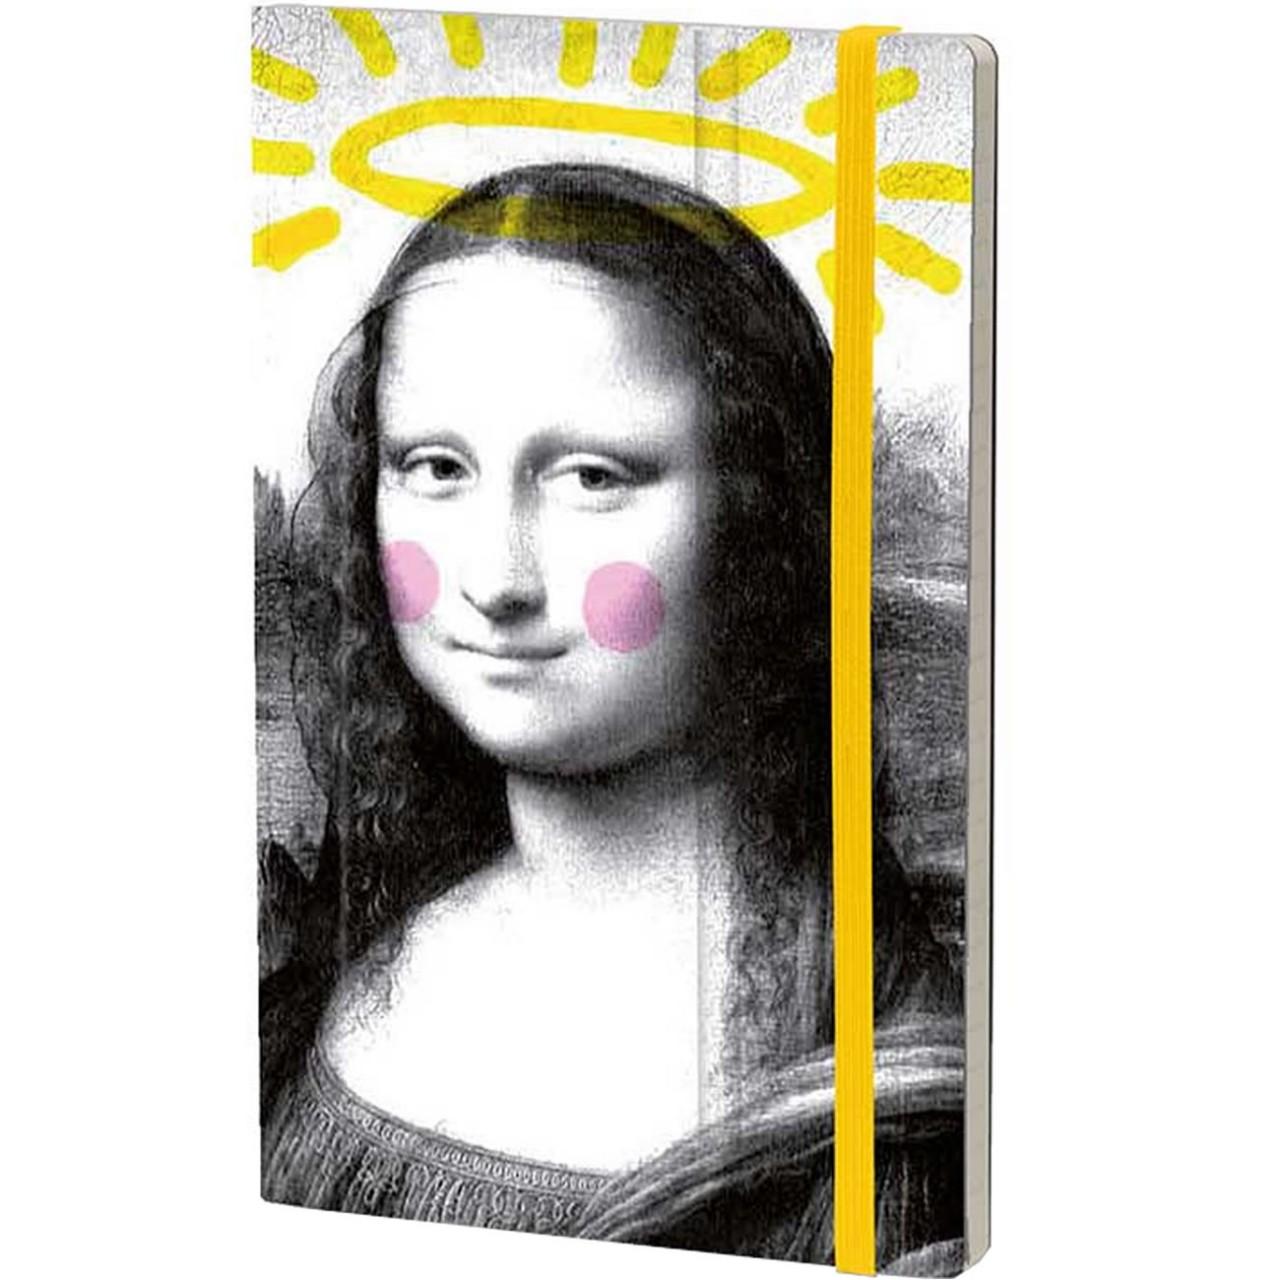 Stifflexible Notizbuch ART 9 x 14 cm 144 S., ANGEL